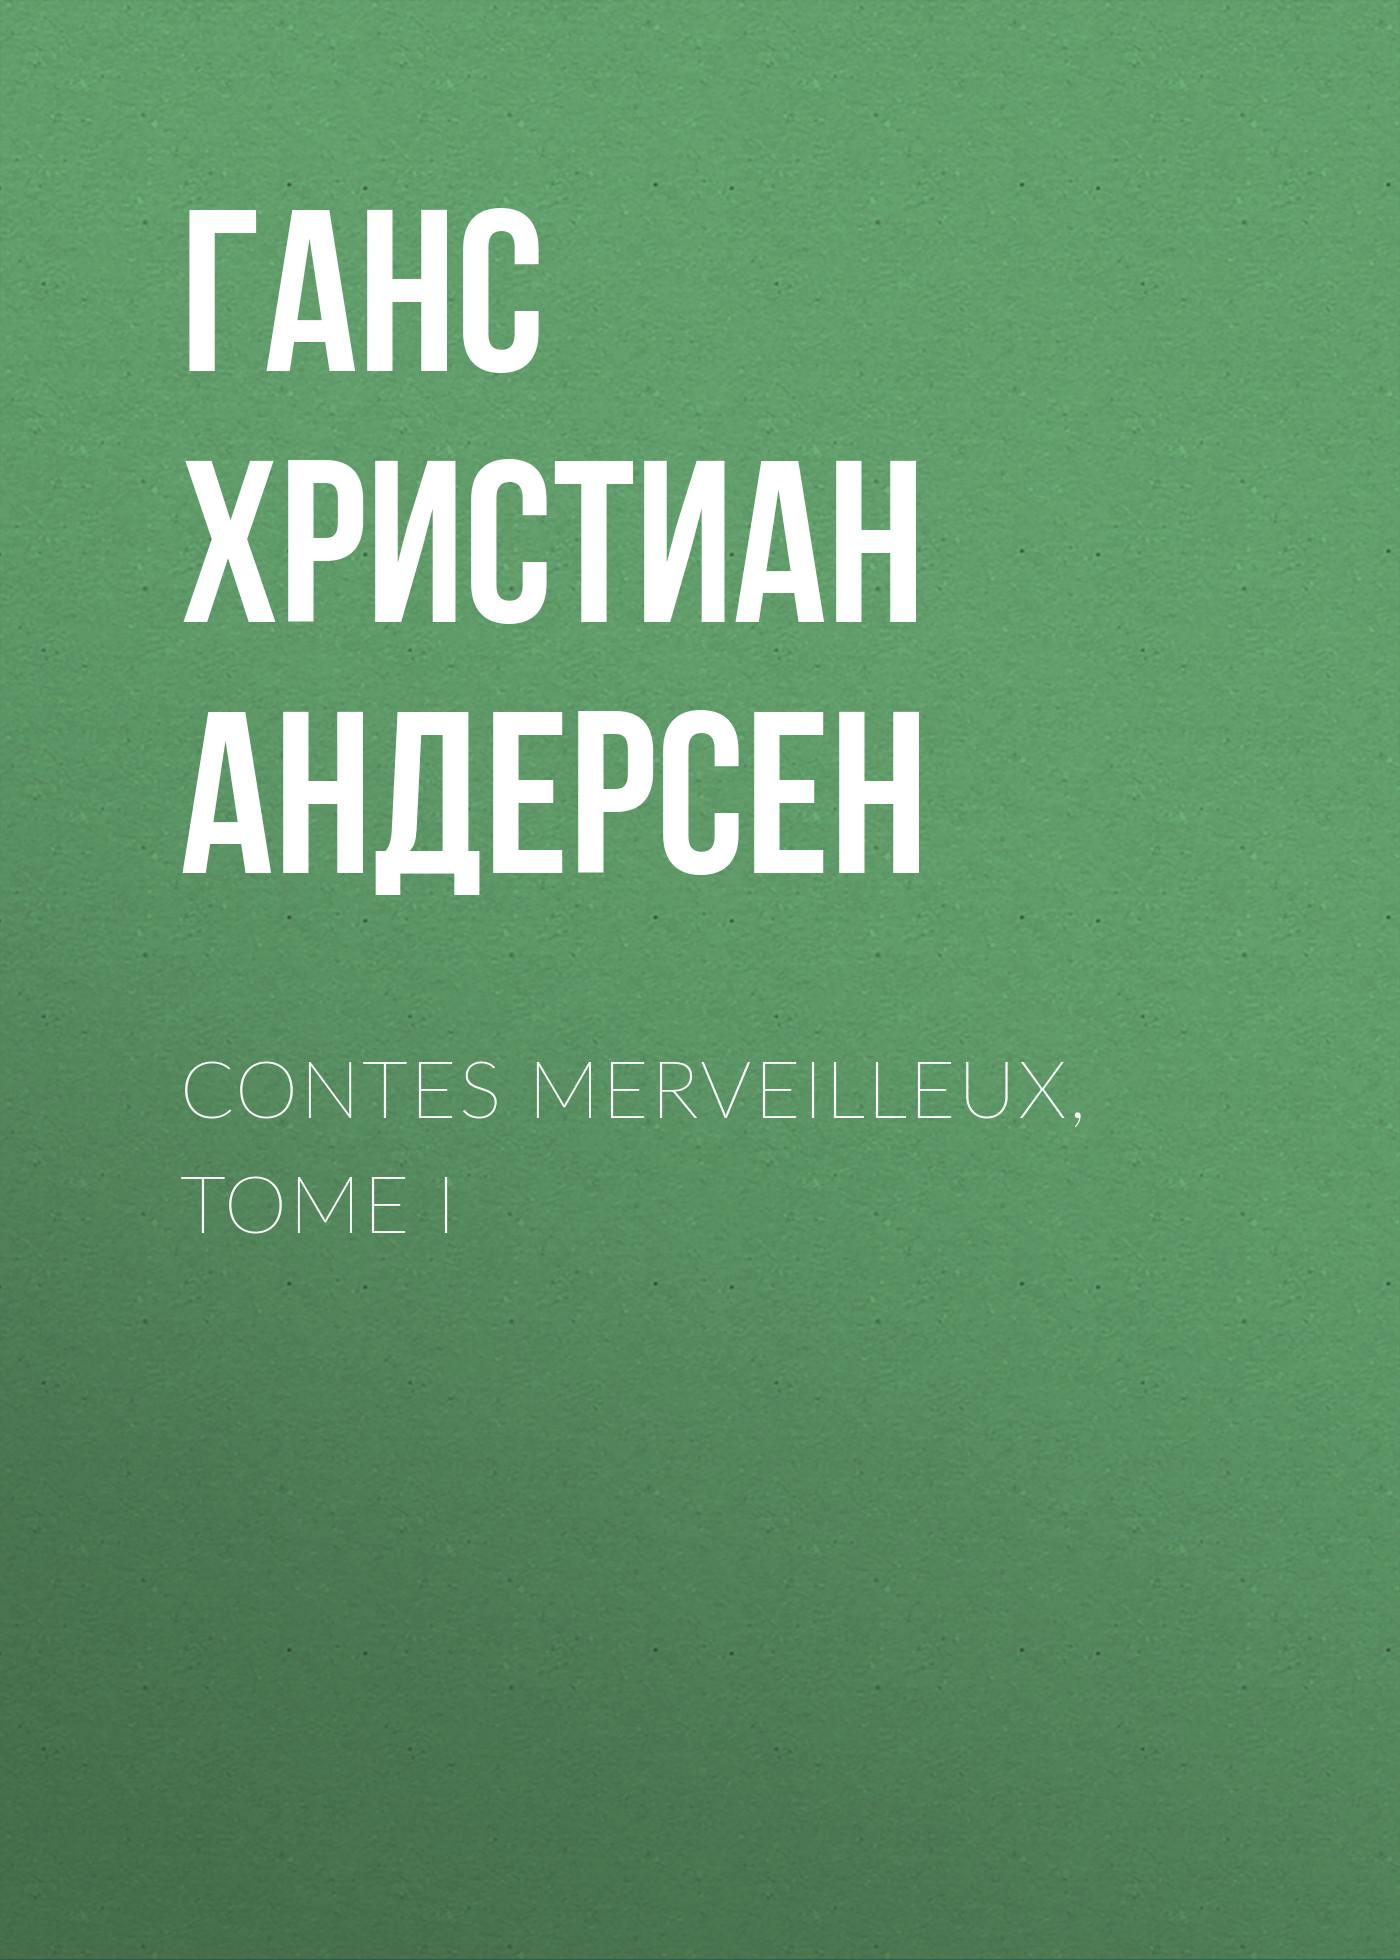 Ганс Христиан Андерсен Contes merveilleux, Tome I ганс христиан андерсен contes merveilleux tome ii